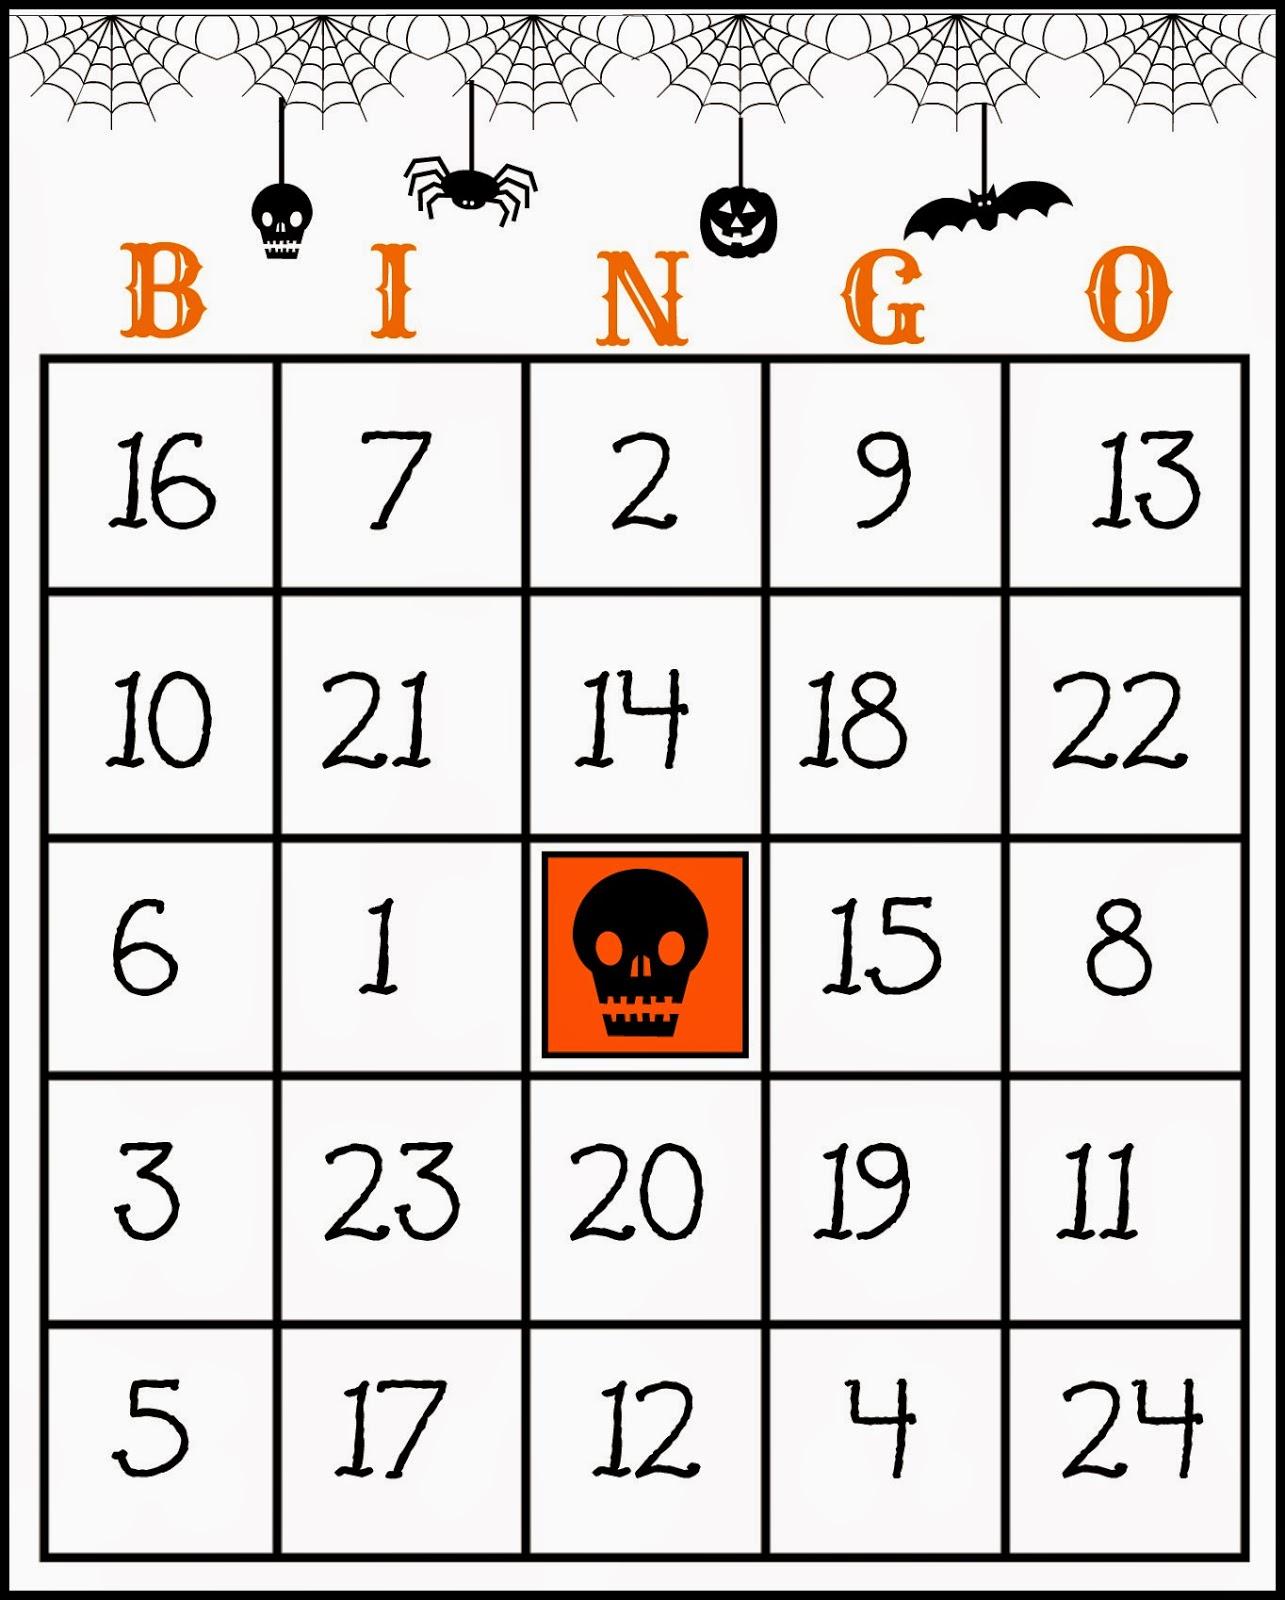 Crafty In Crosby: Free Printable Halloween Bingo Game - Math Bingo Free Printable